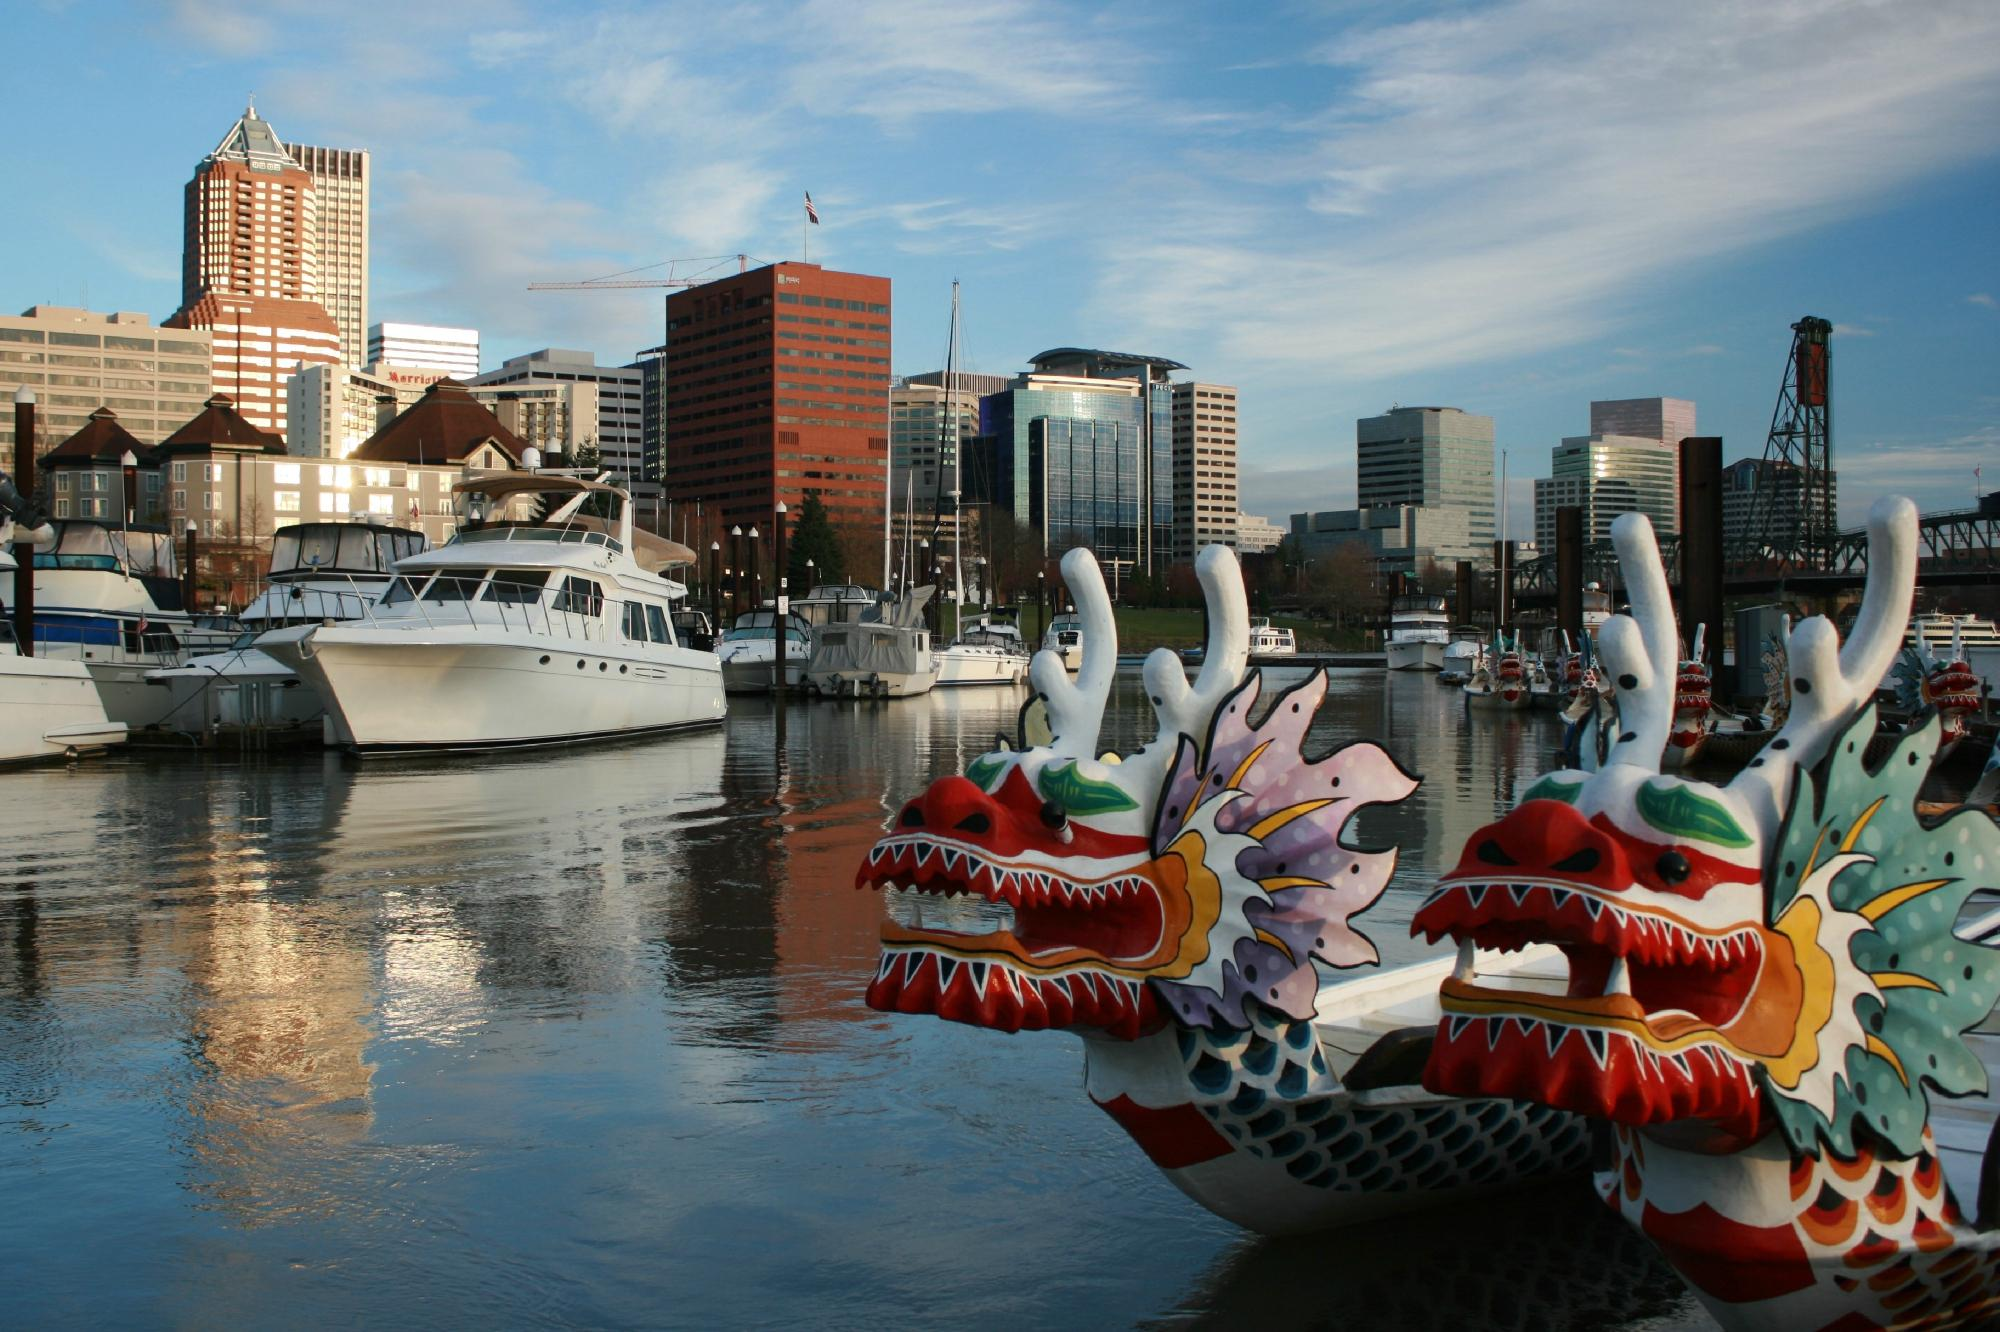 Dragon boats on Willamette River